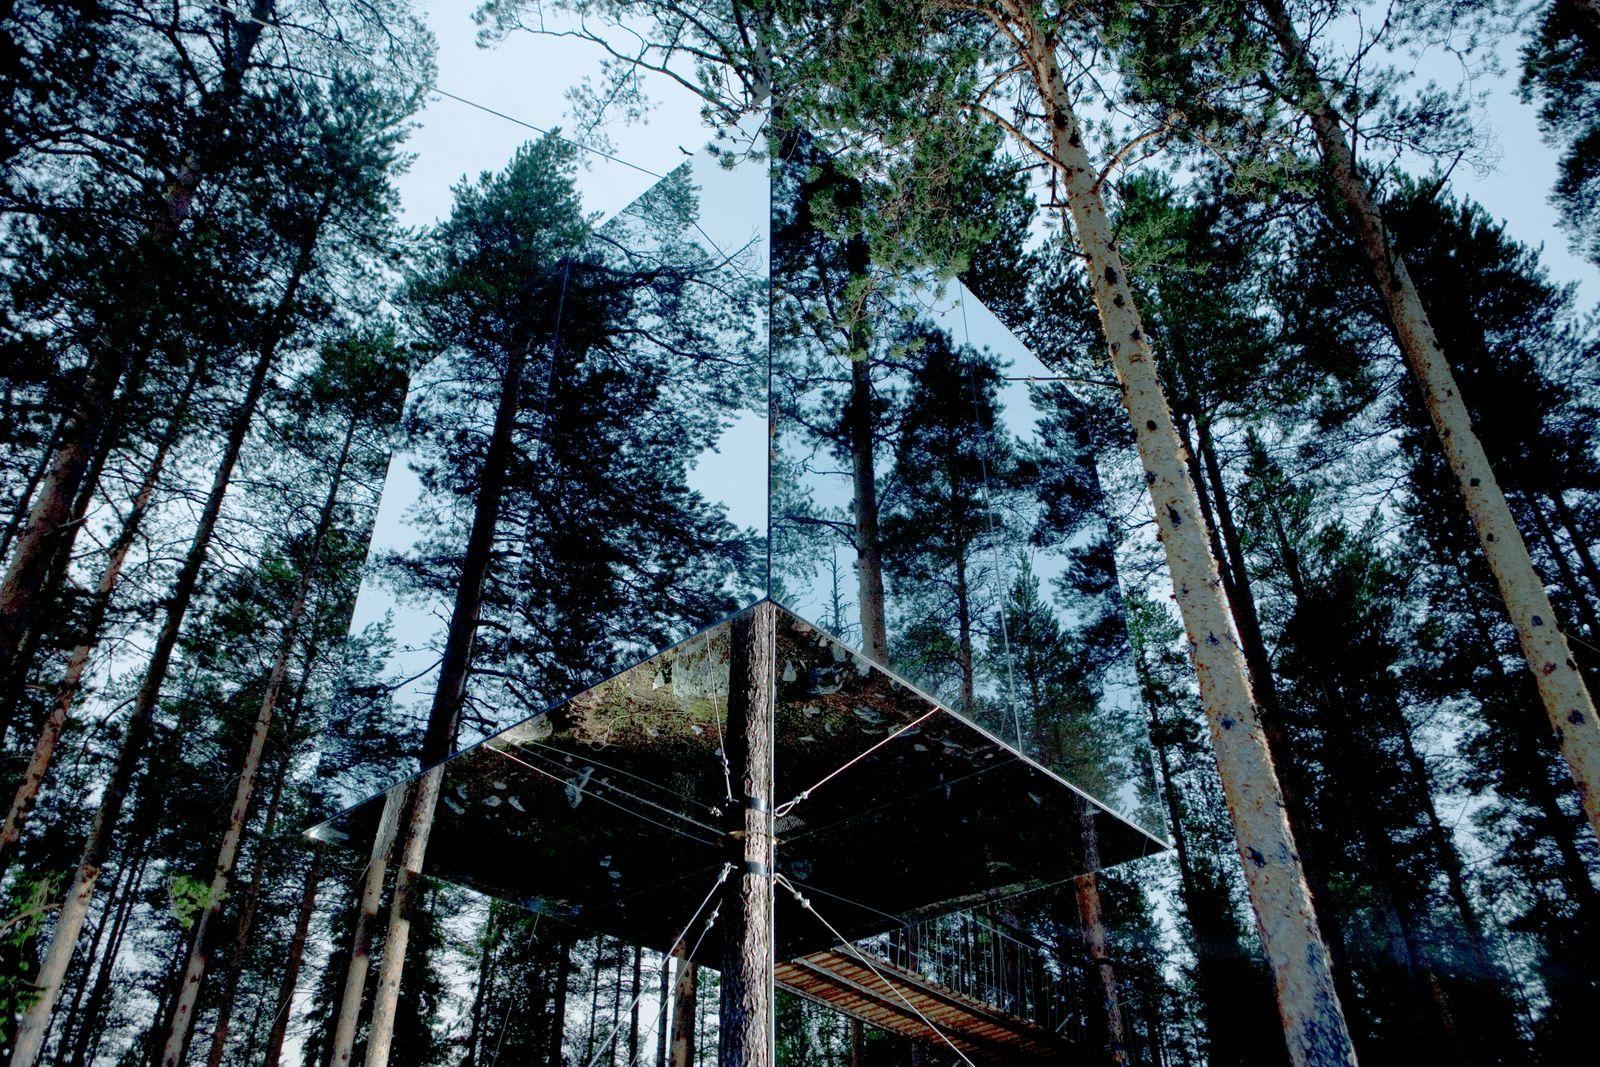 p.126-27_PhotoKentLindvall,StayWild,CanopyandStars,gestalten2021